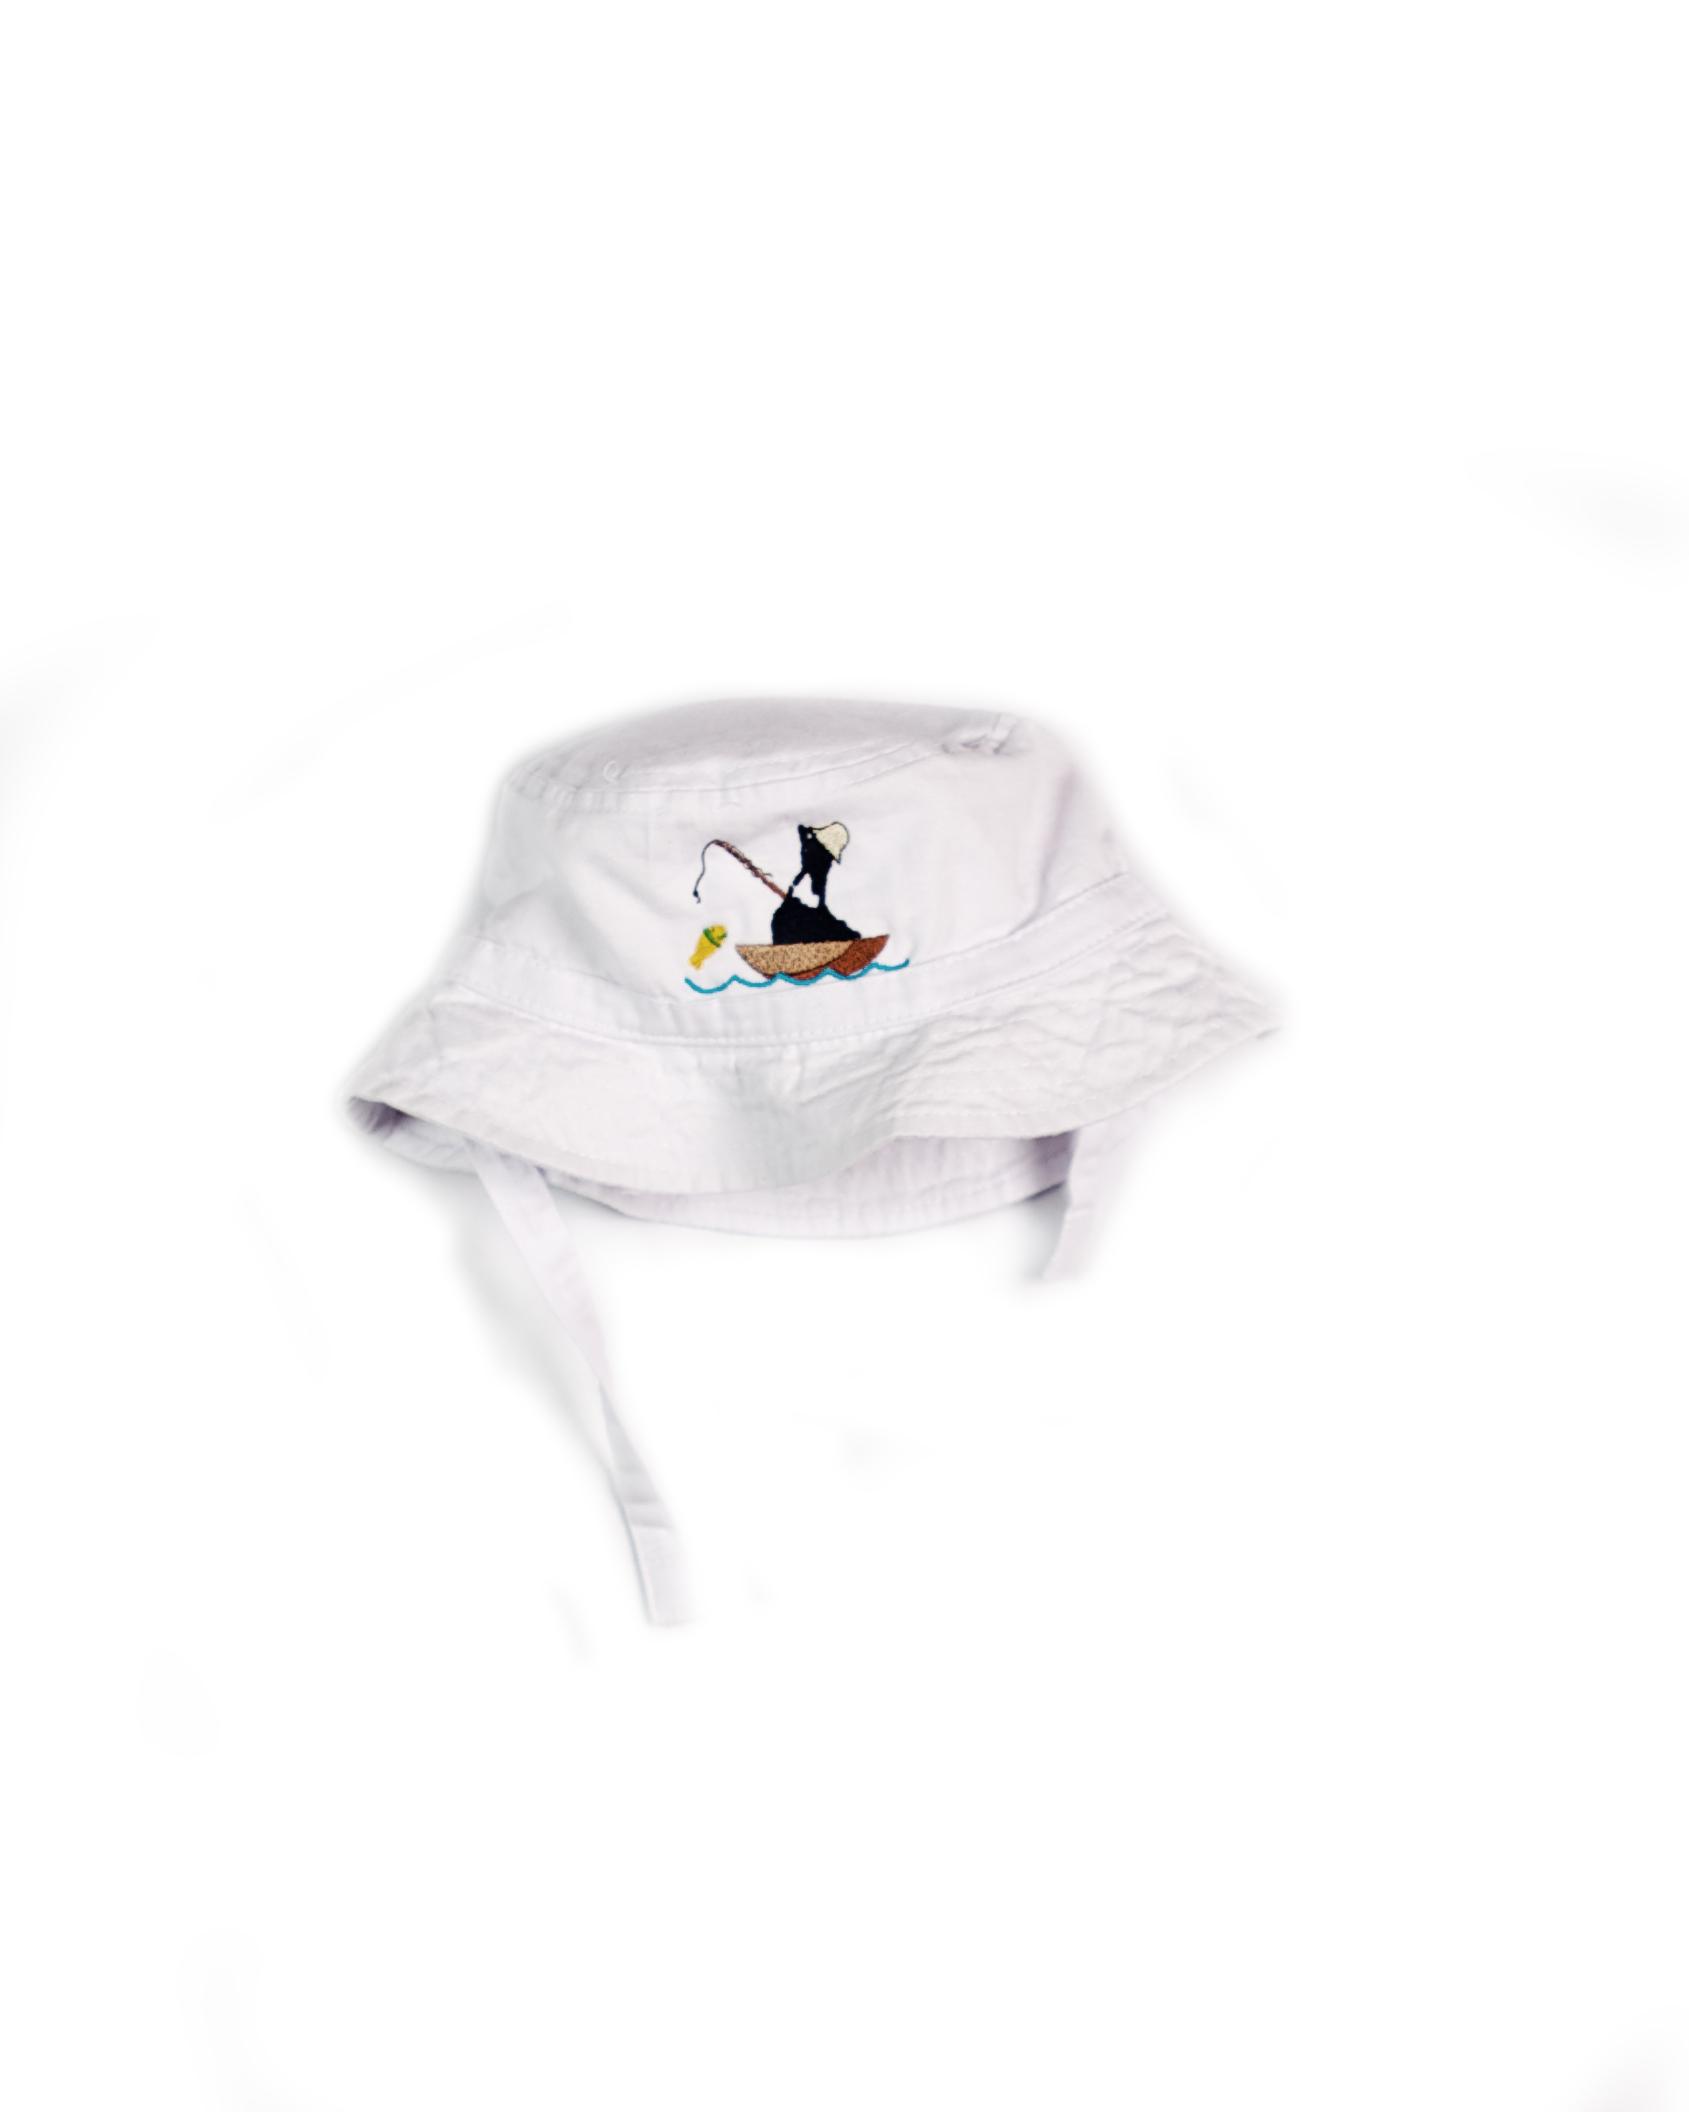 Infant bucket cap fishing duck block island hat for White cap fish